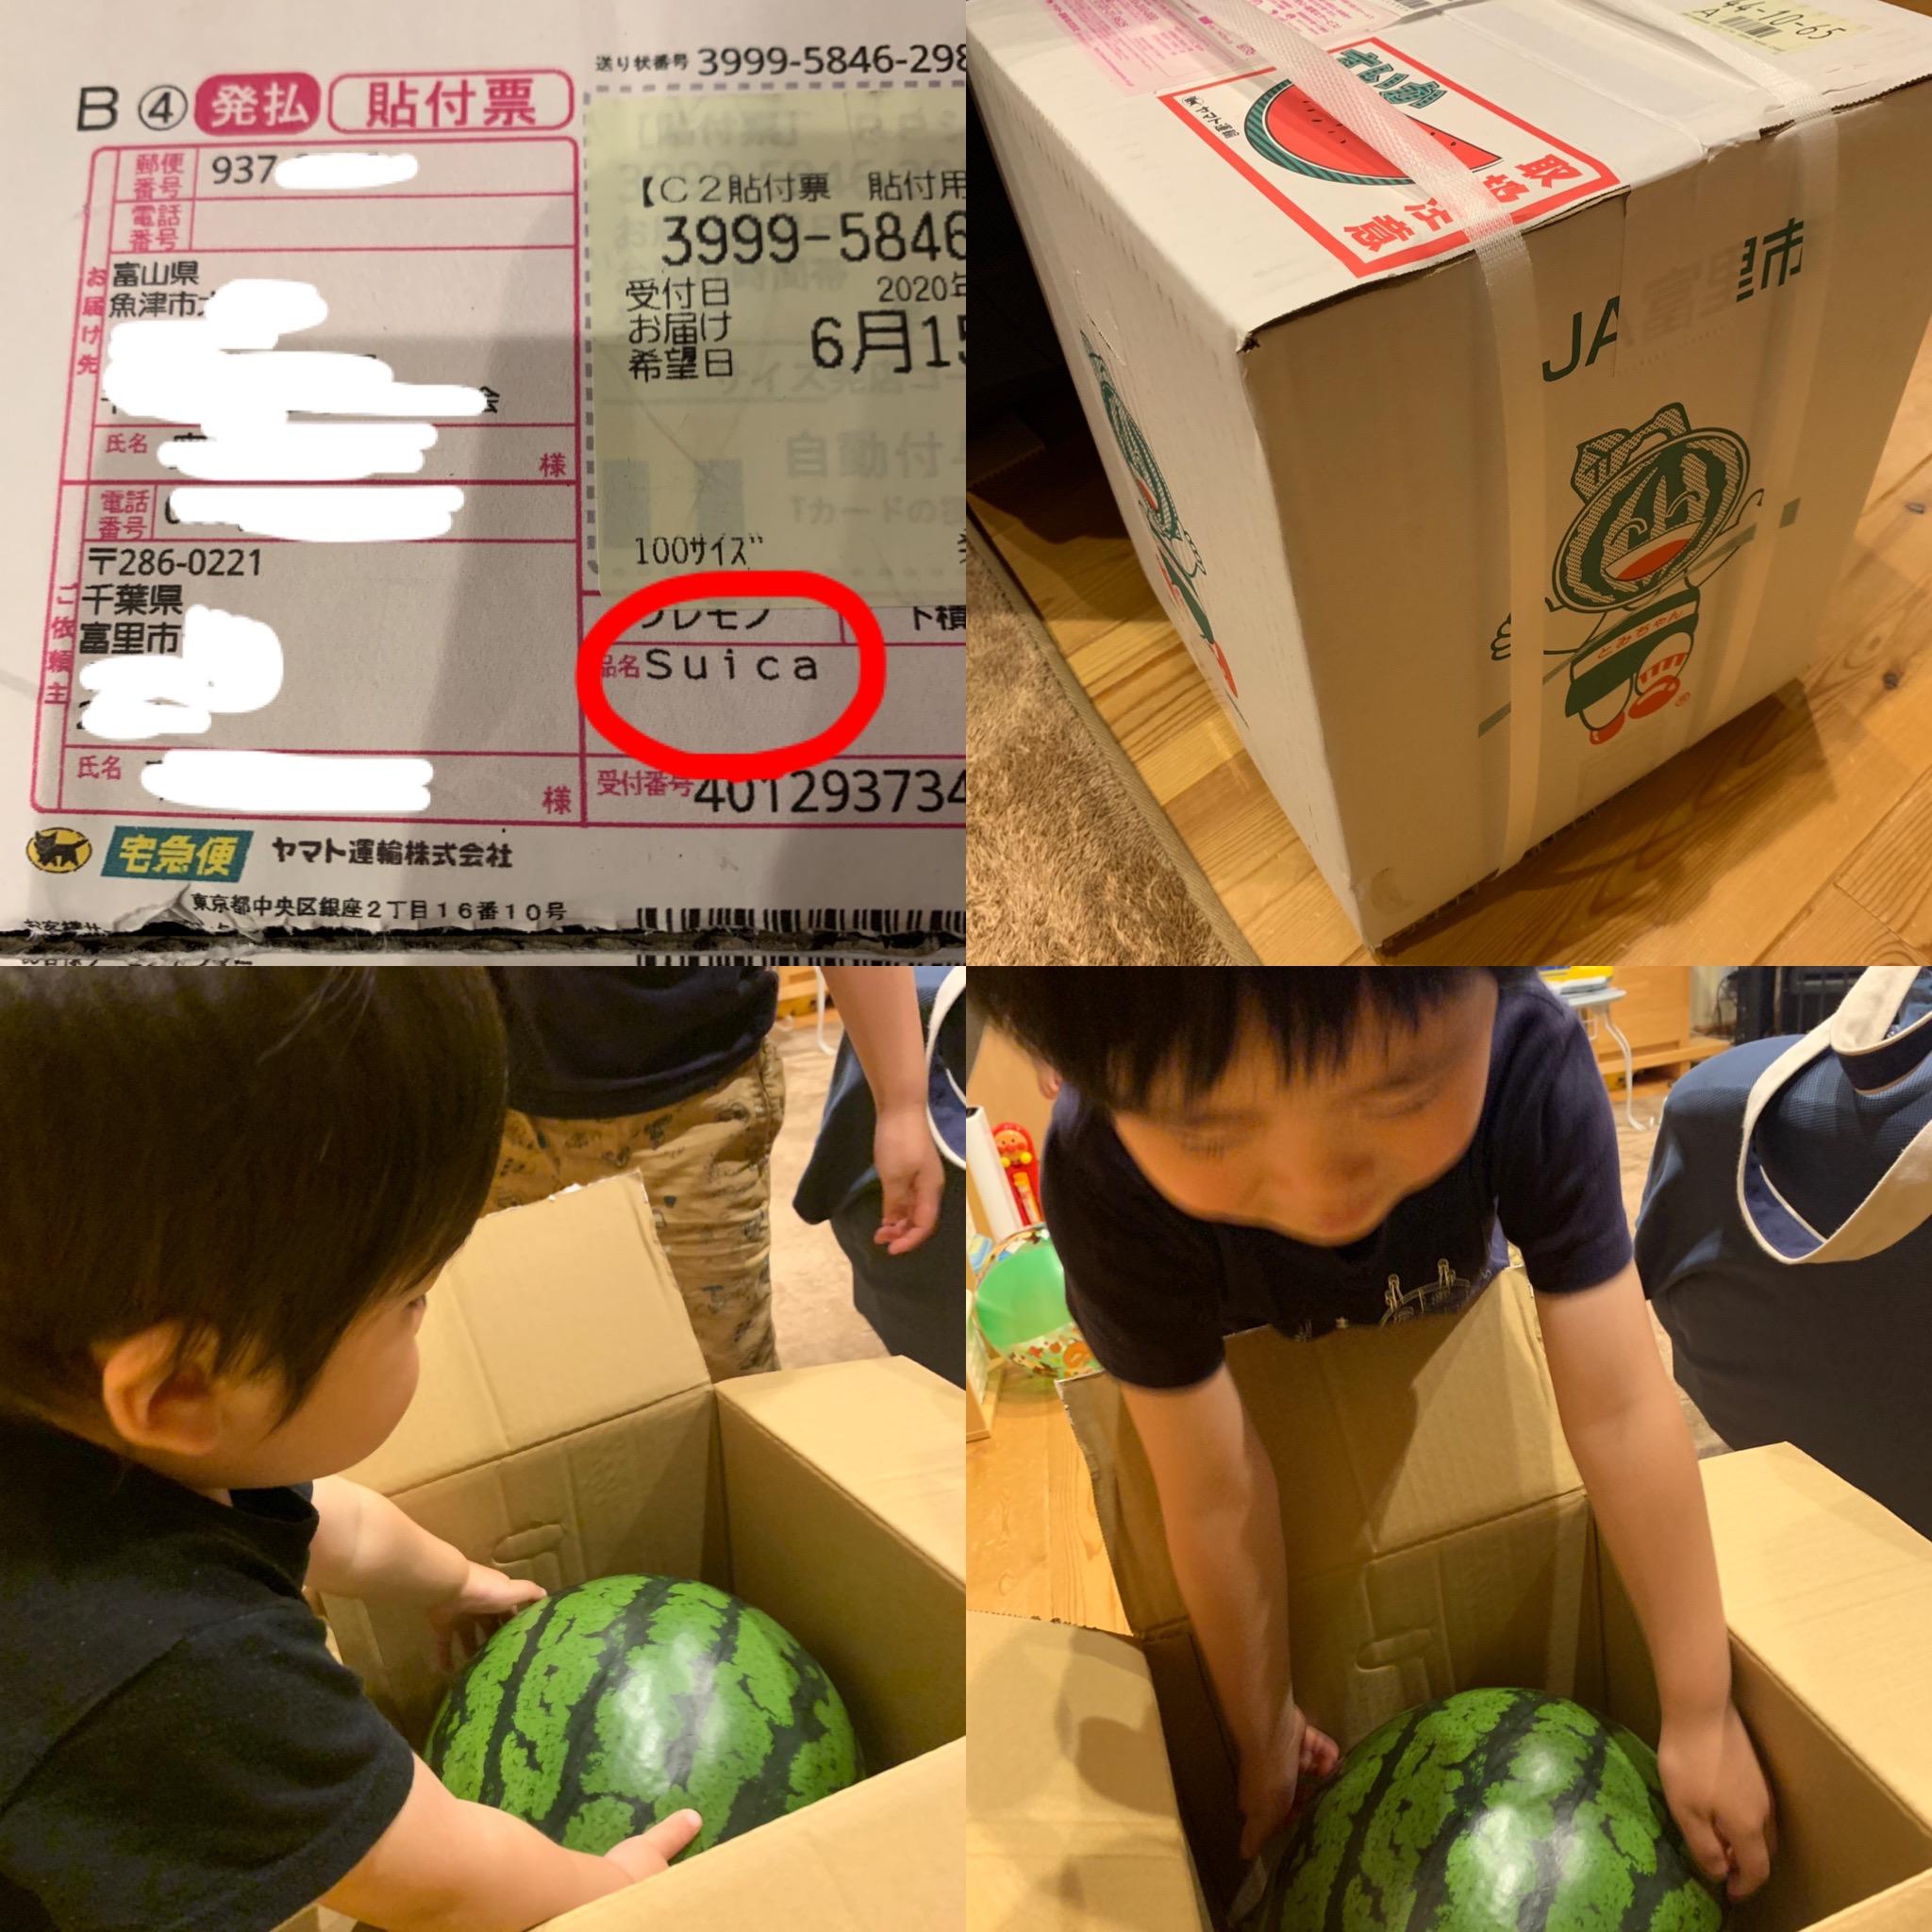 https://n-ko.jp/staffblog/2020/06/20/20200620_083500020_iOS.jpg